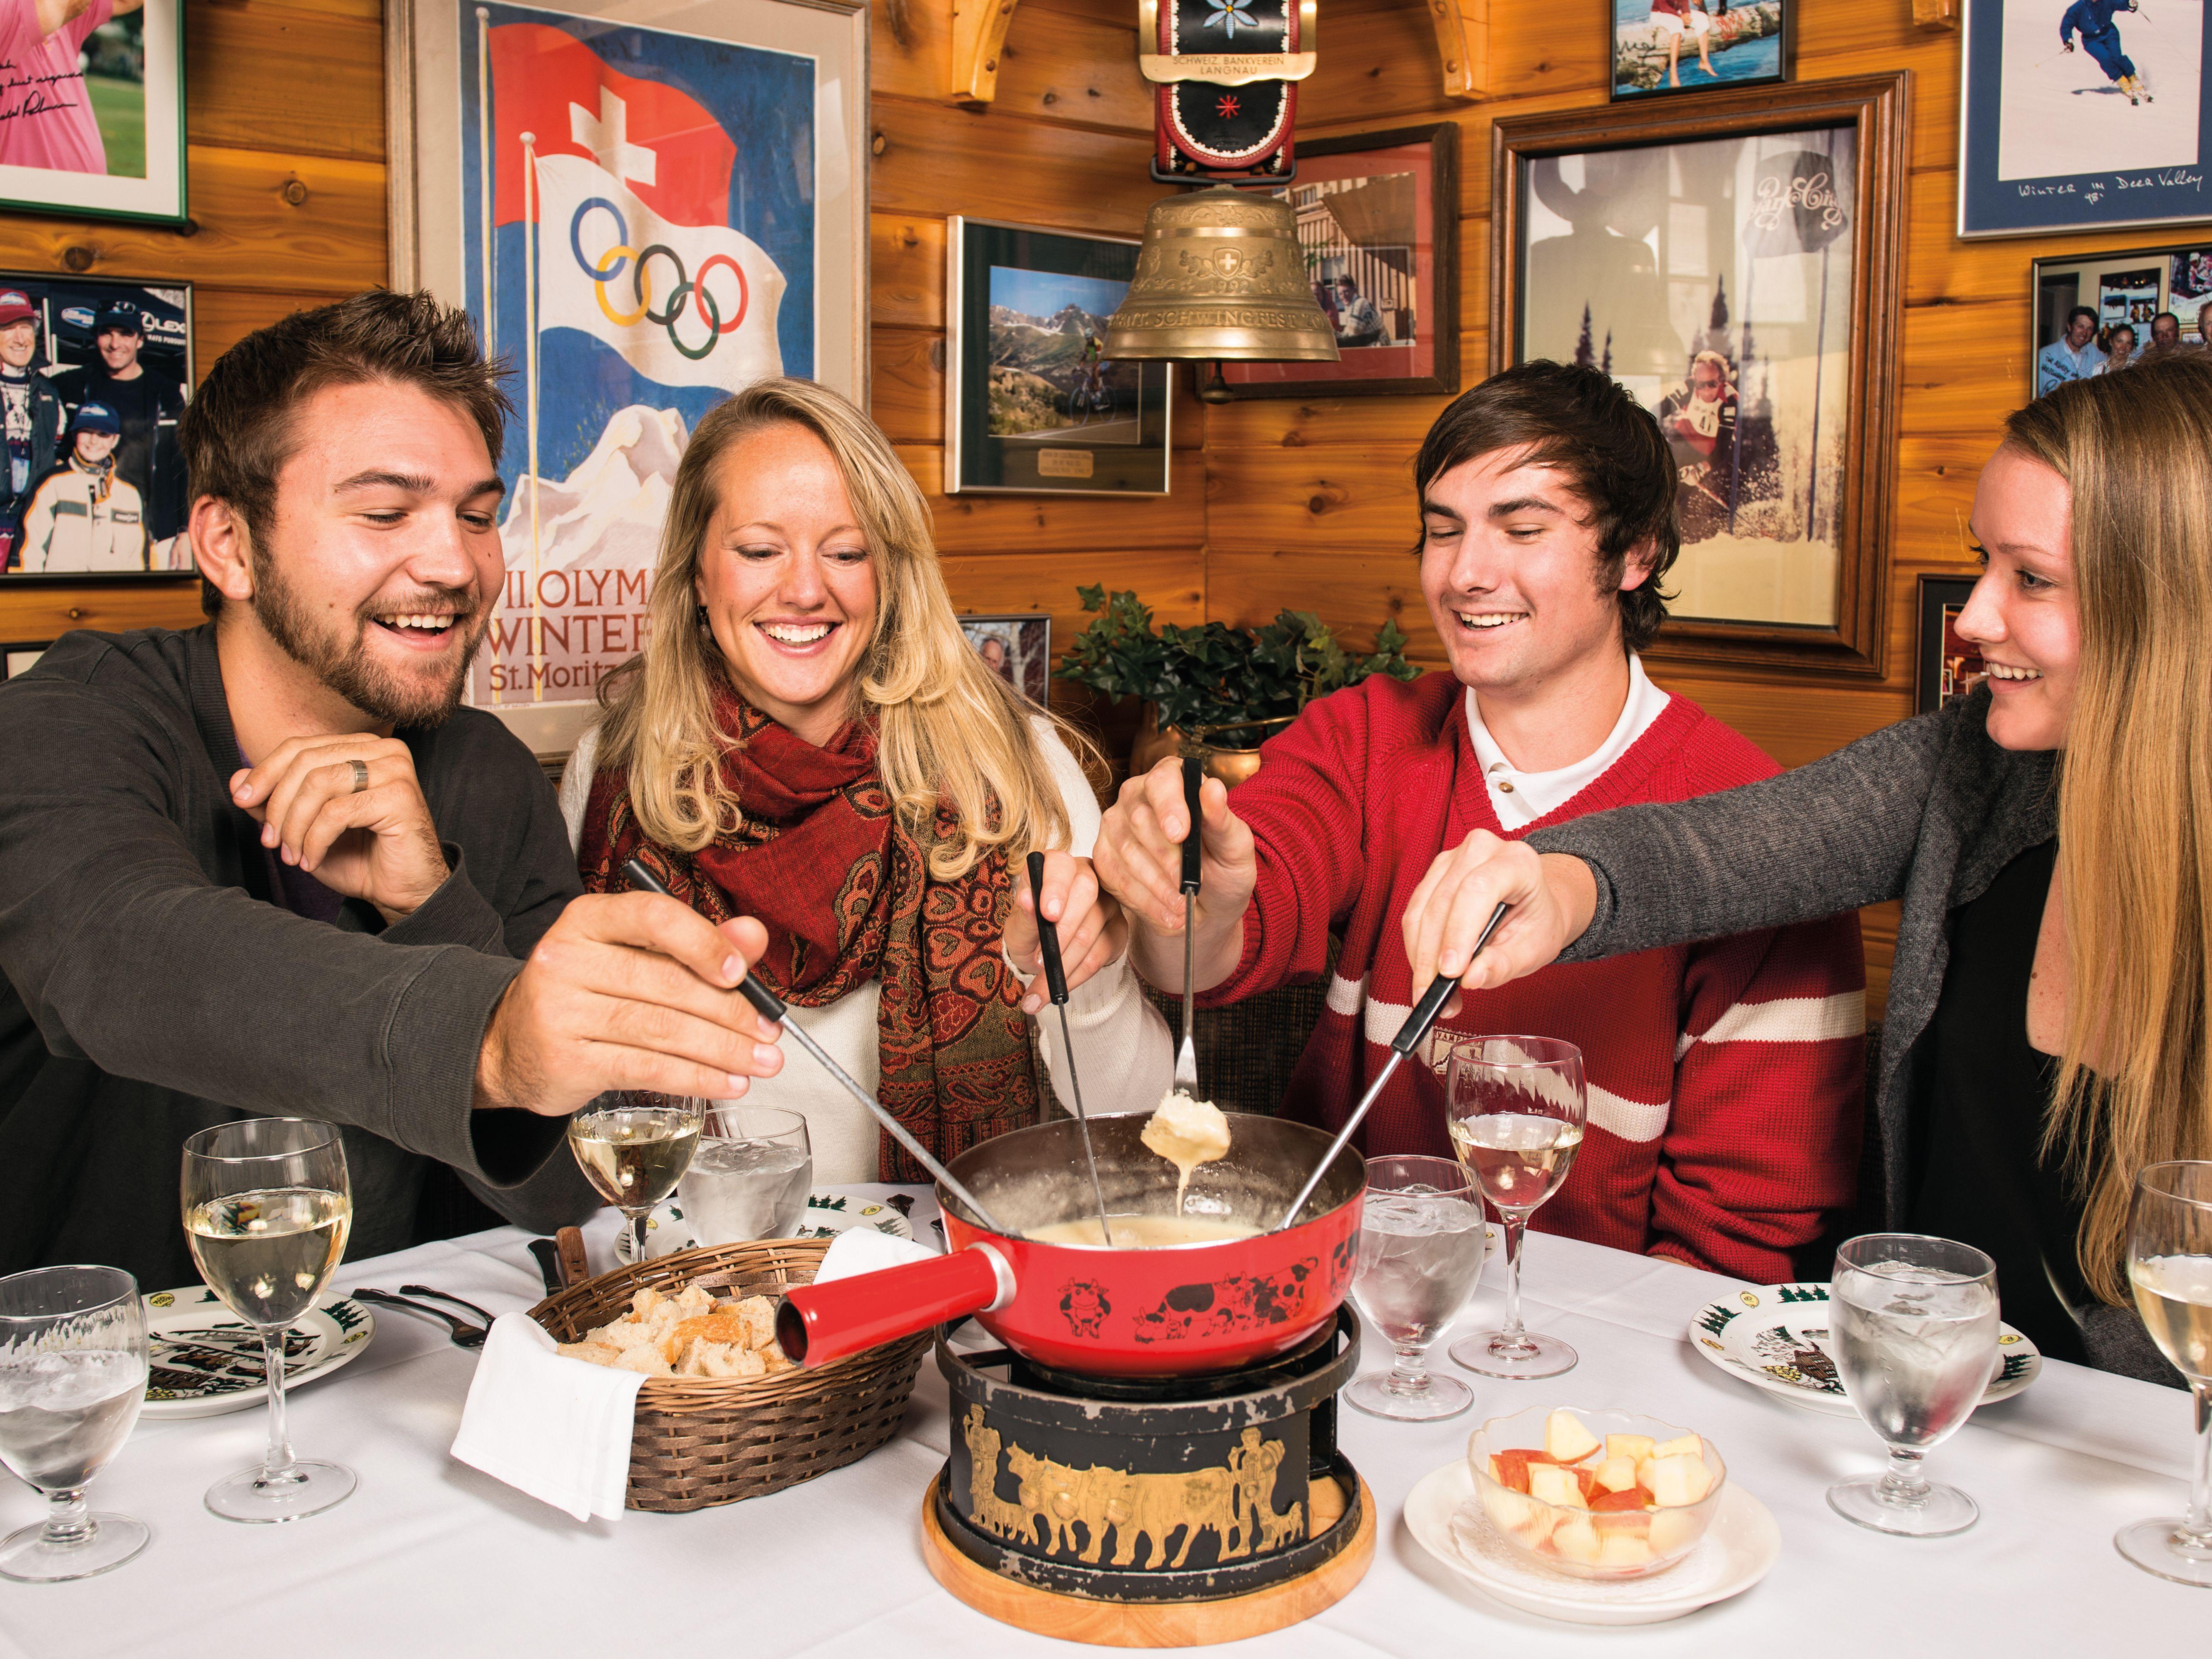 Park city dining fondue featured trkwtc